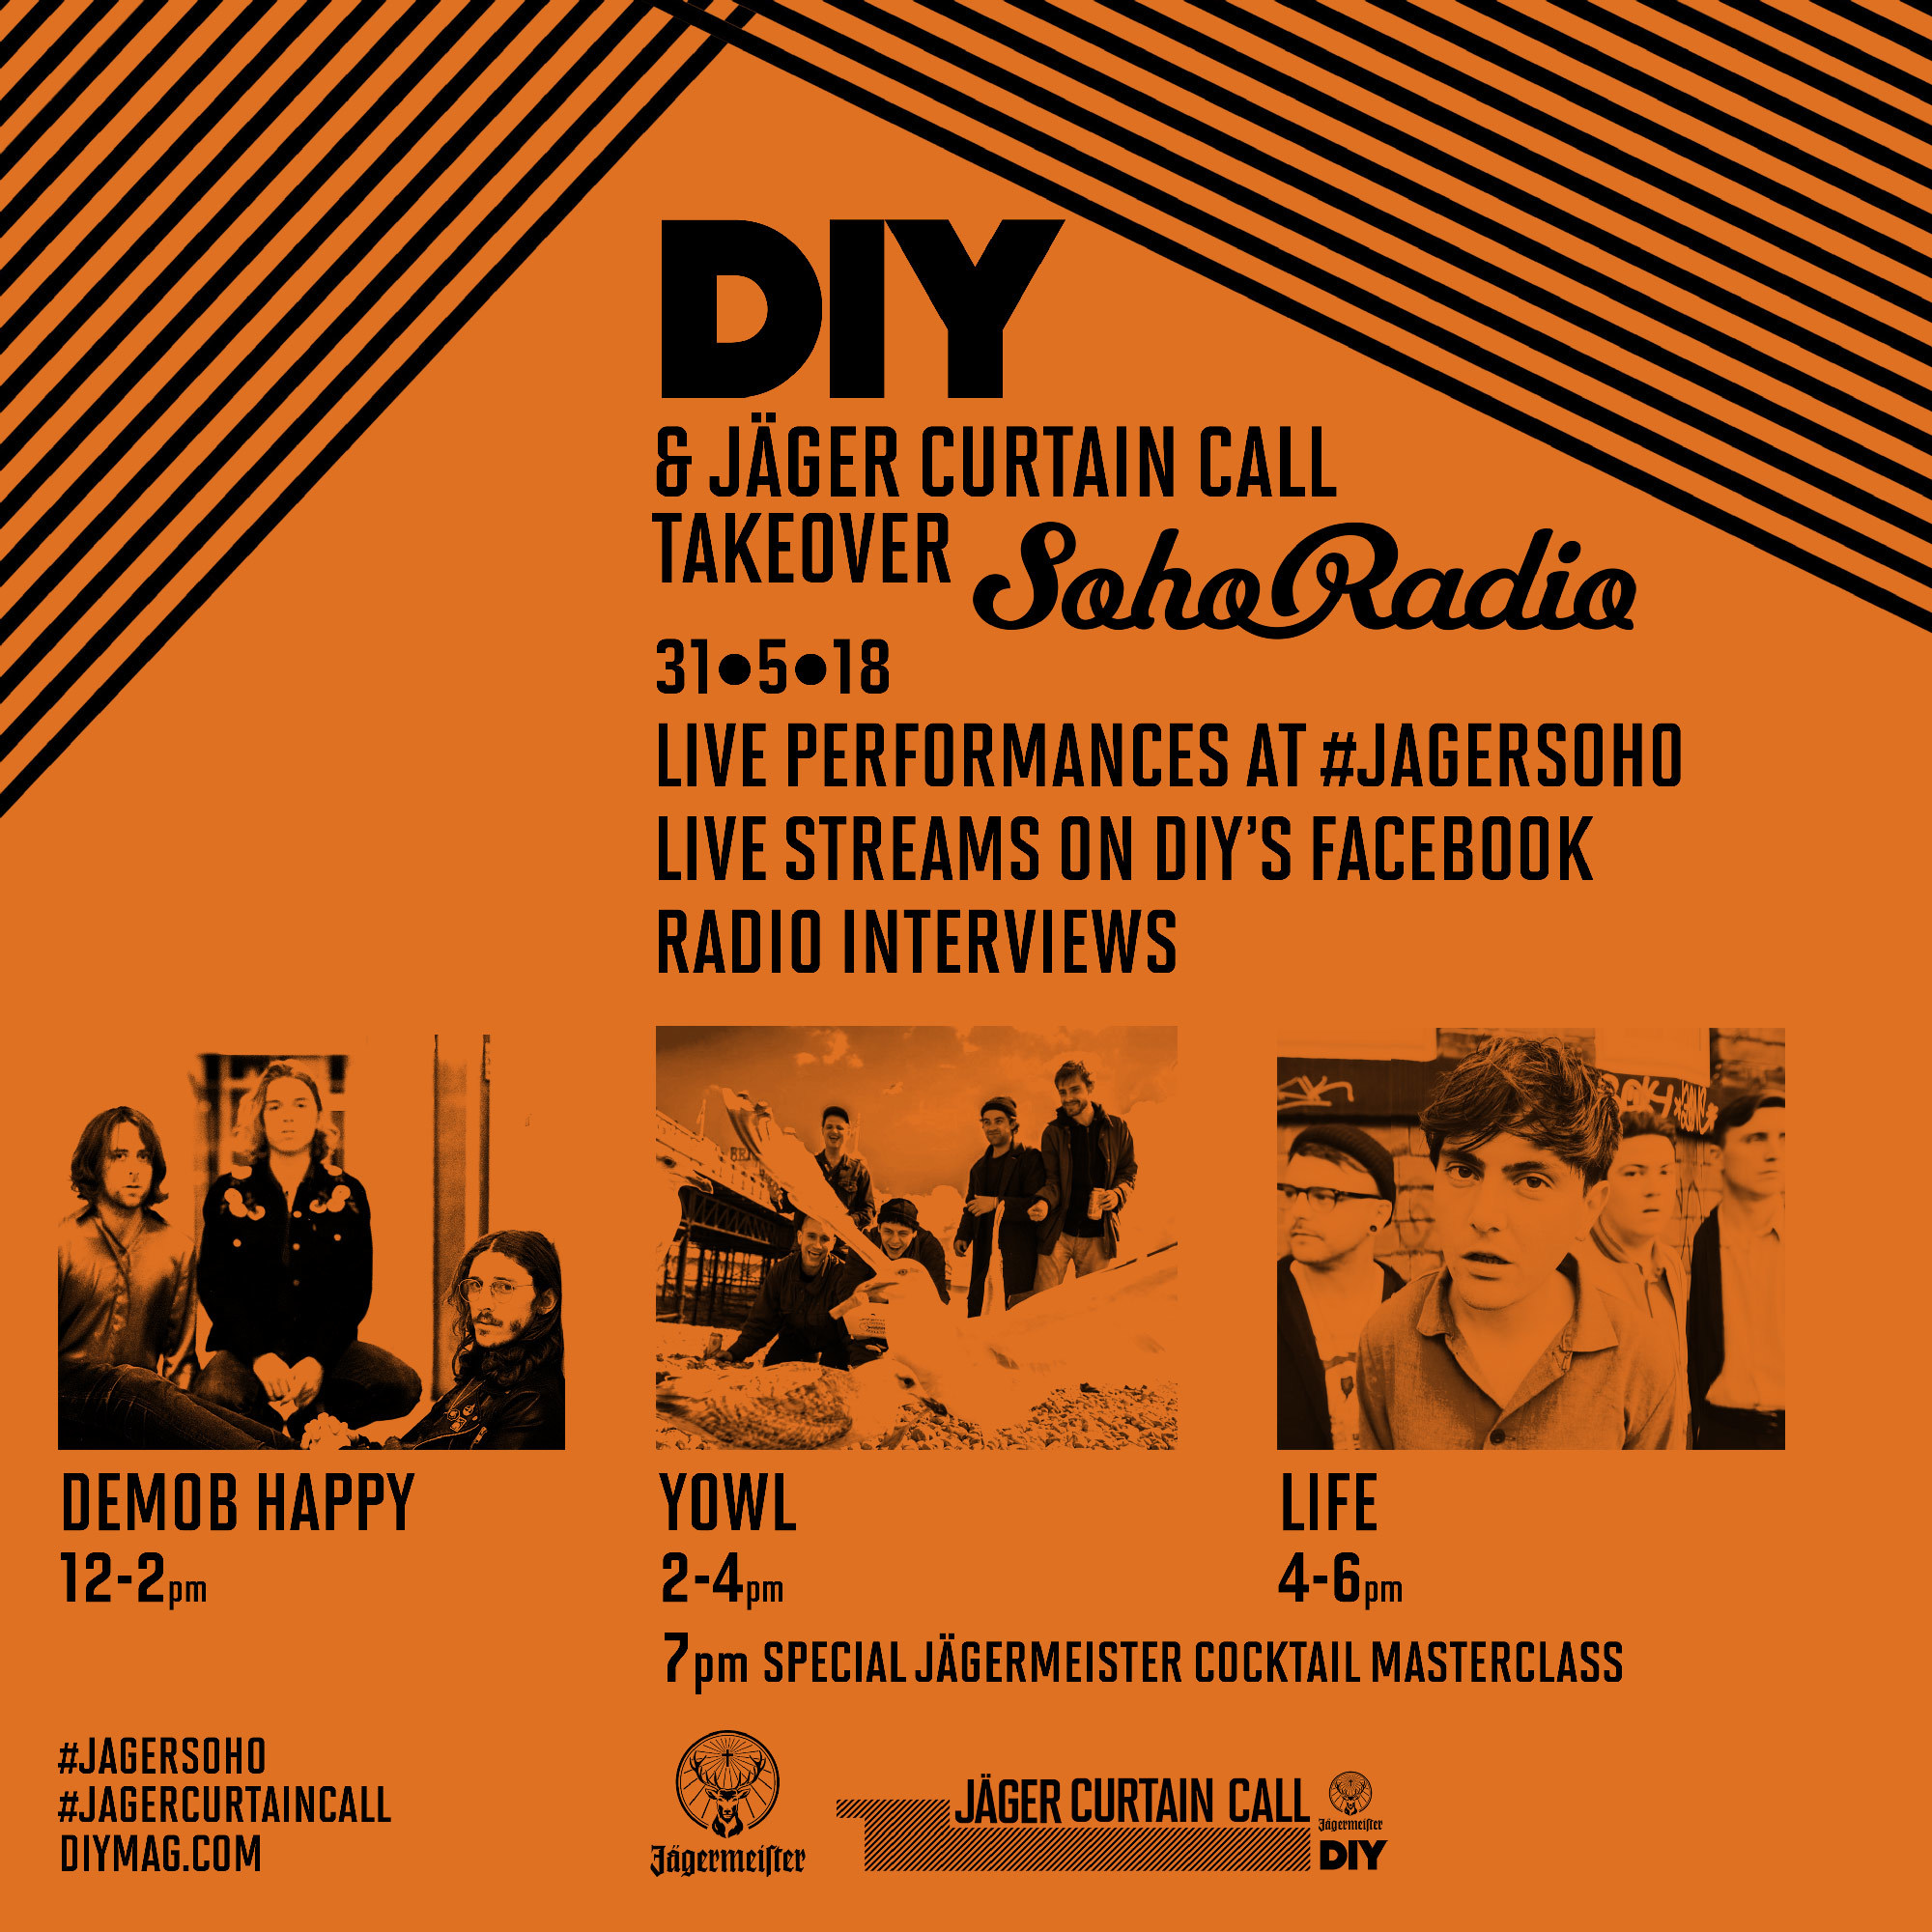 We're bringing Yowl, LIFE and Demob Happy to Soho Radio tomorrow as part of Jäger Curtain Call!